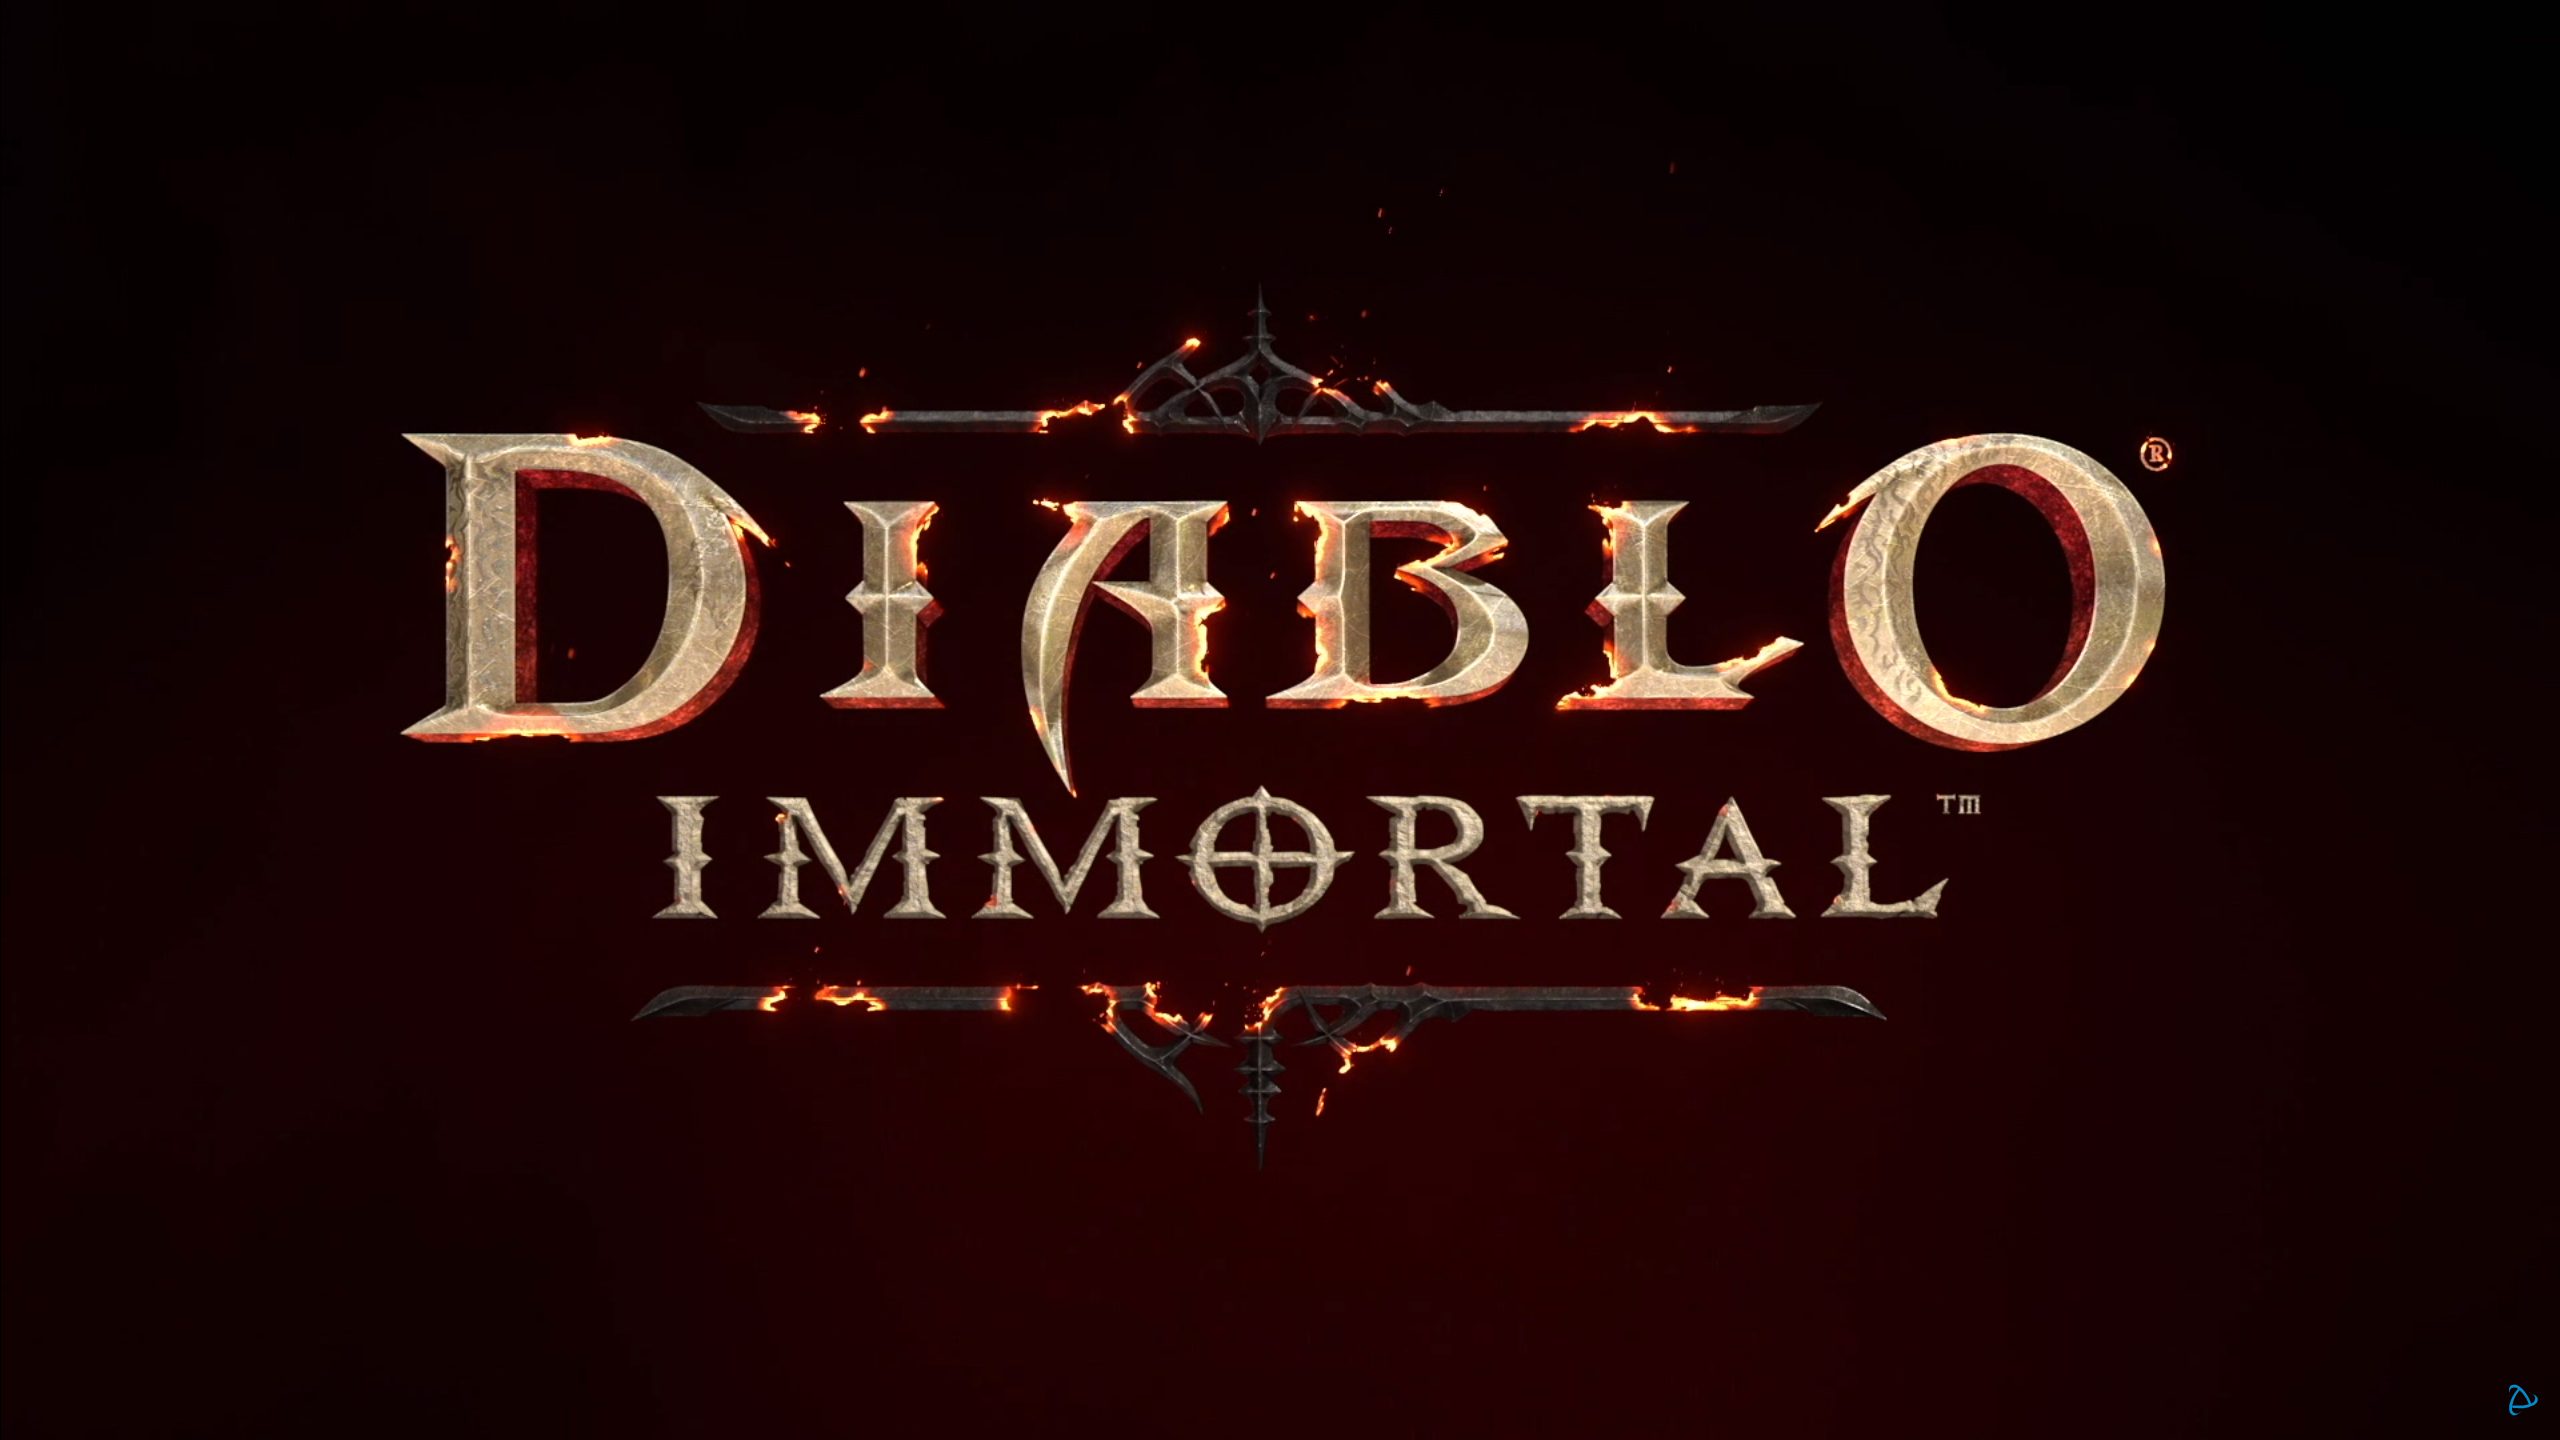 Blizzard announces 'massively multiplayer' Diablo Immortal for mobile